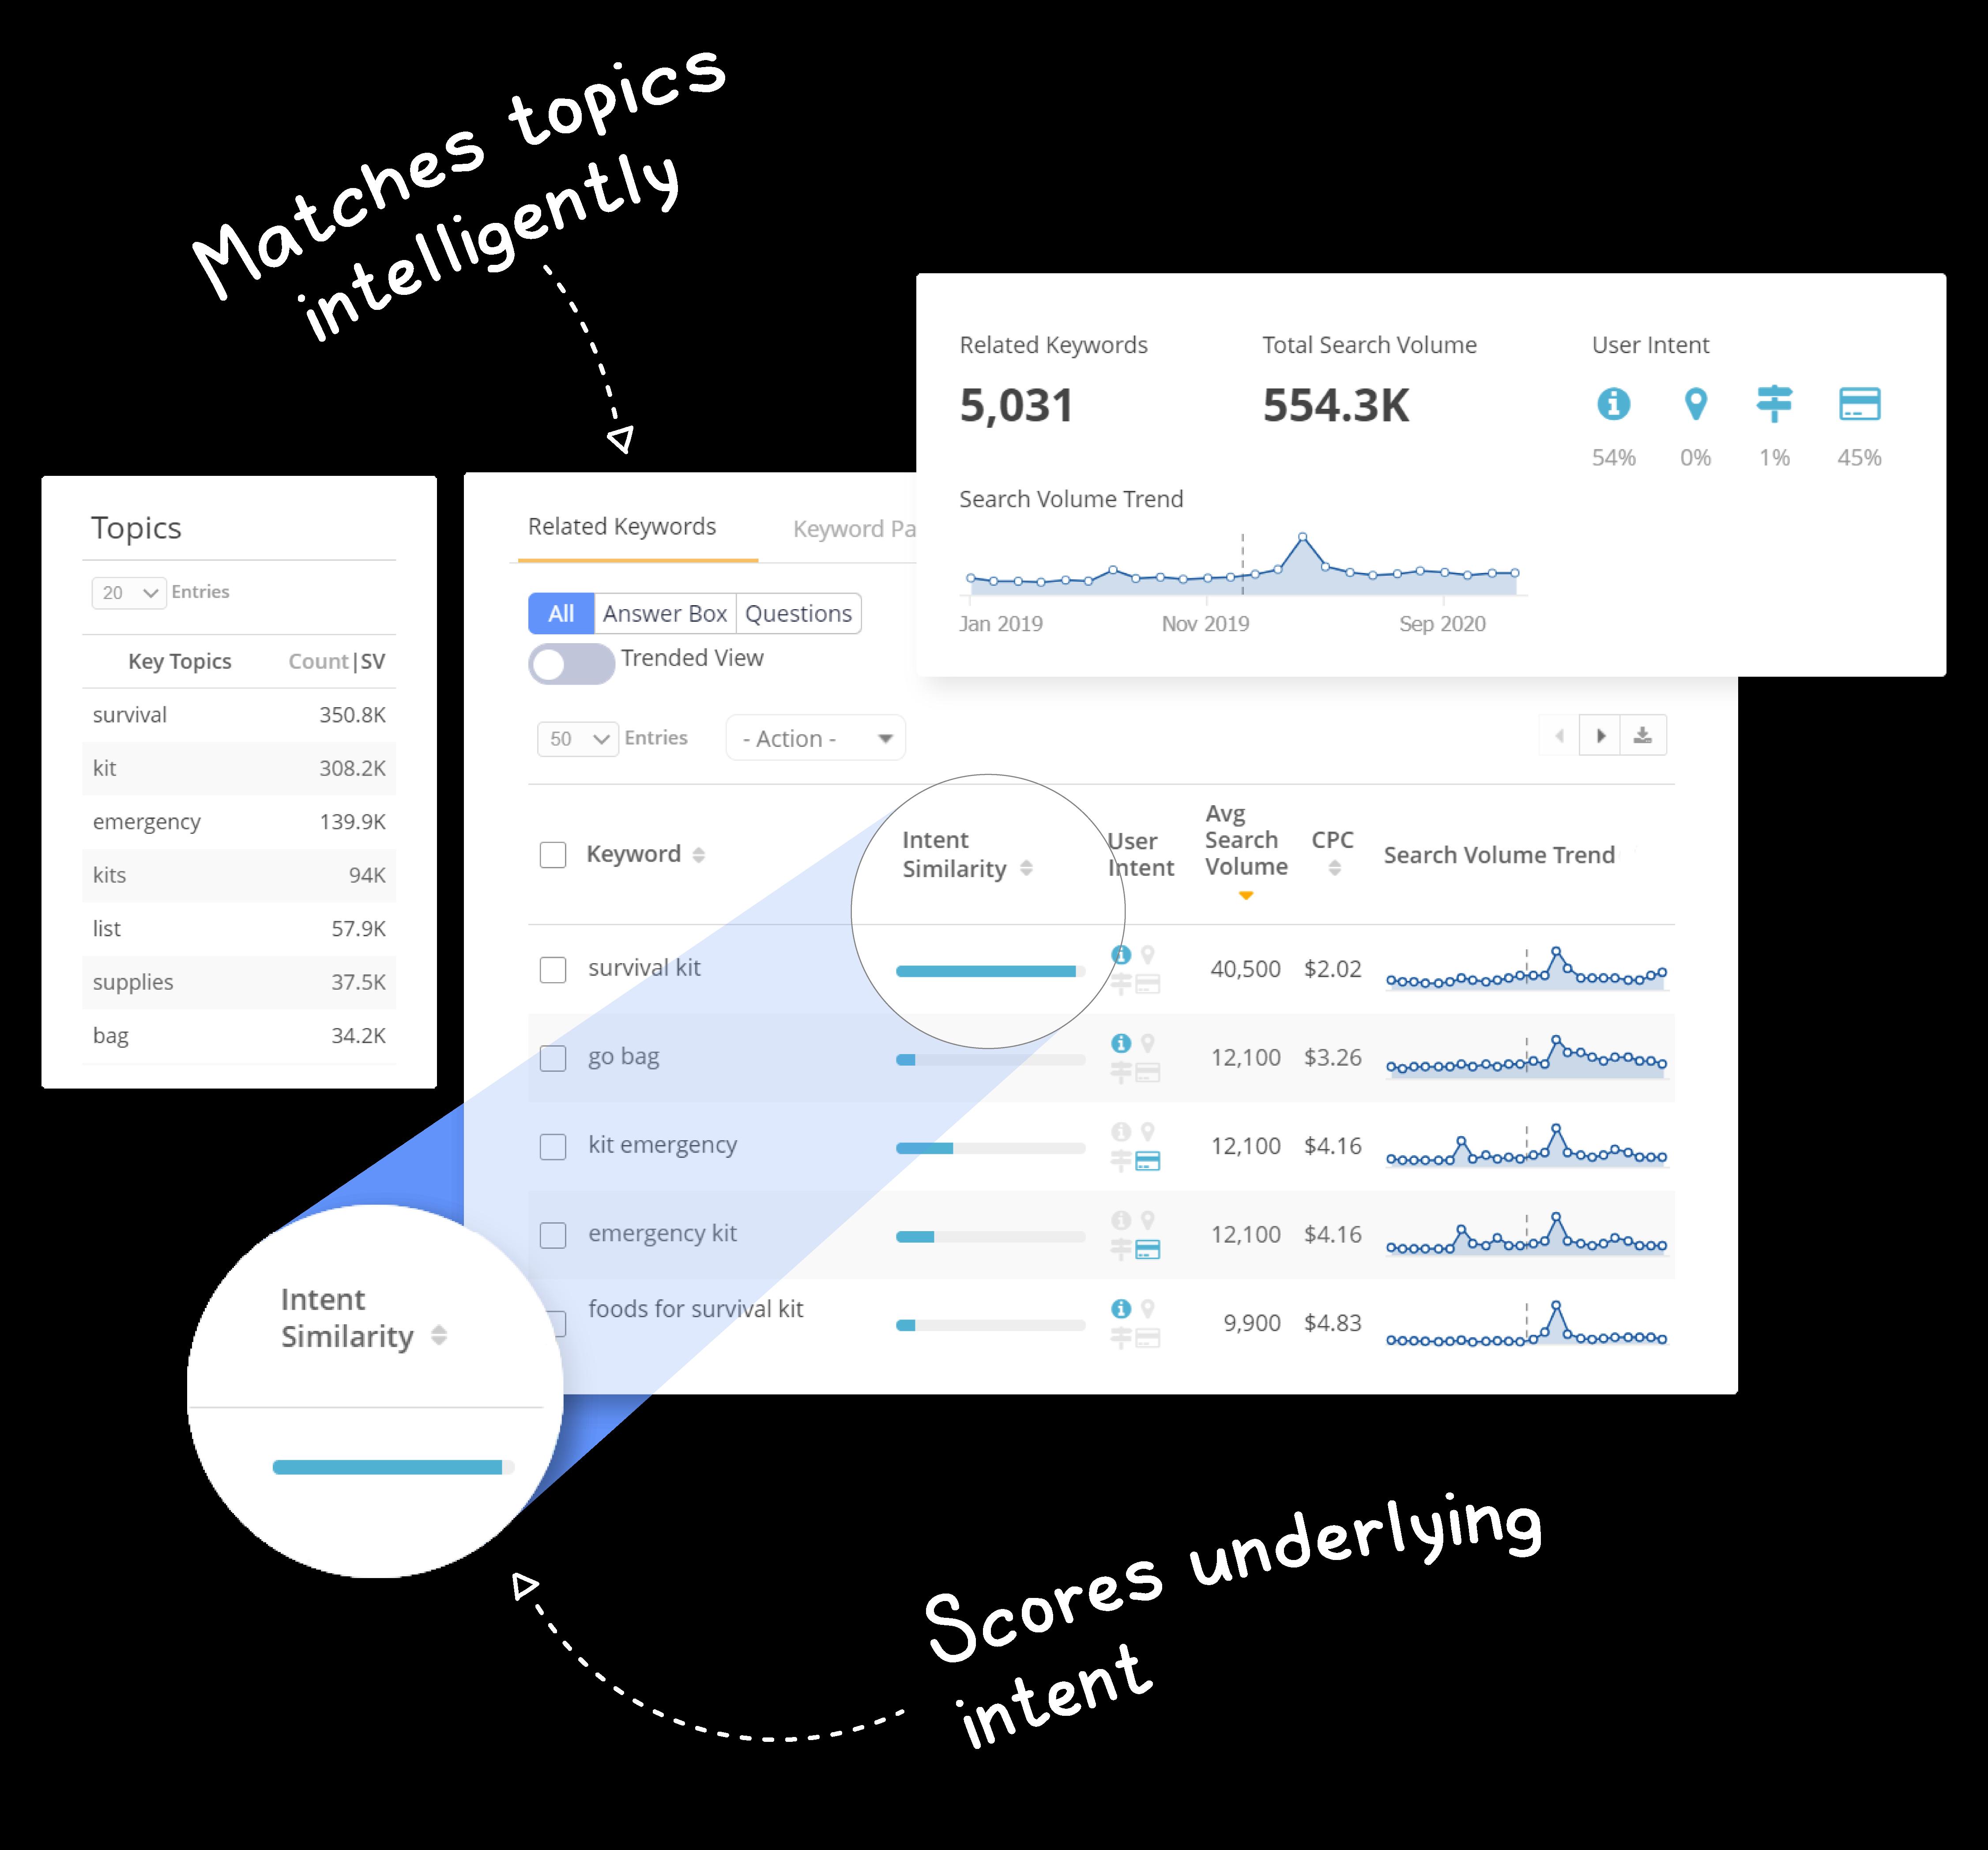 Platform Page Screen Graphics v3.0_Topic Explorer